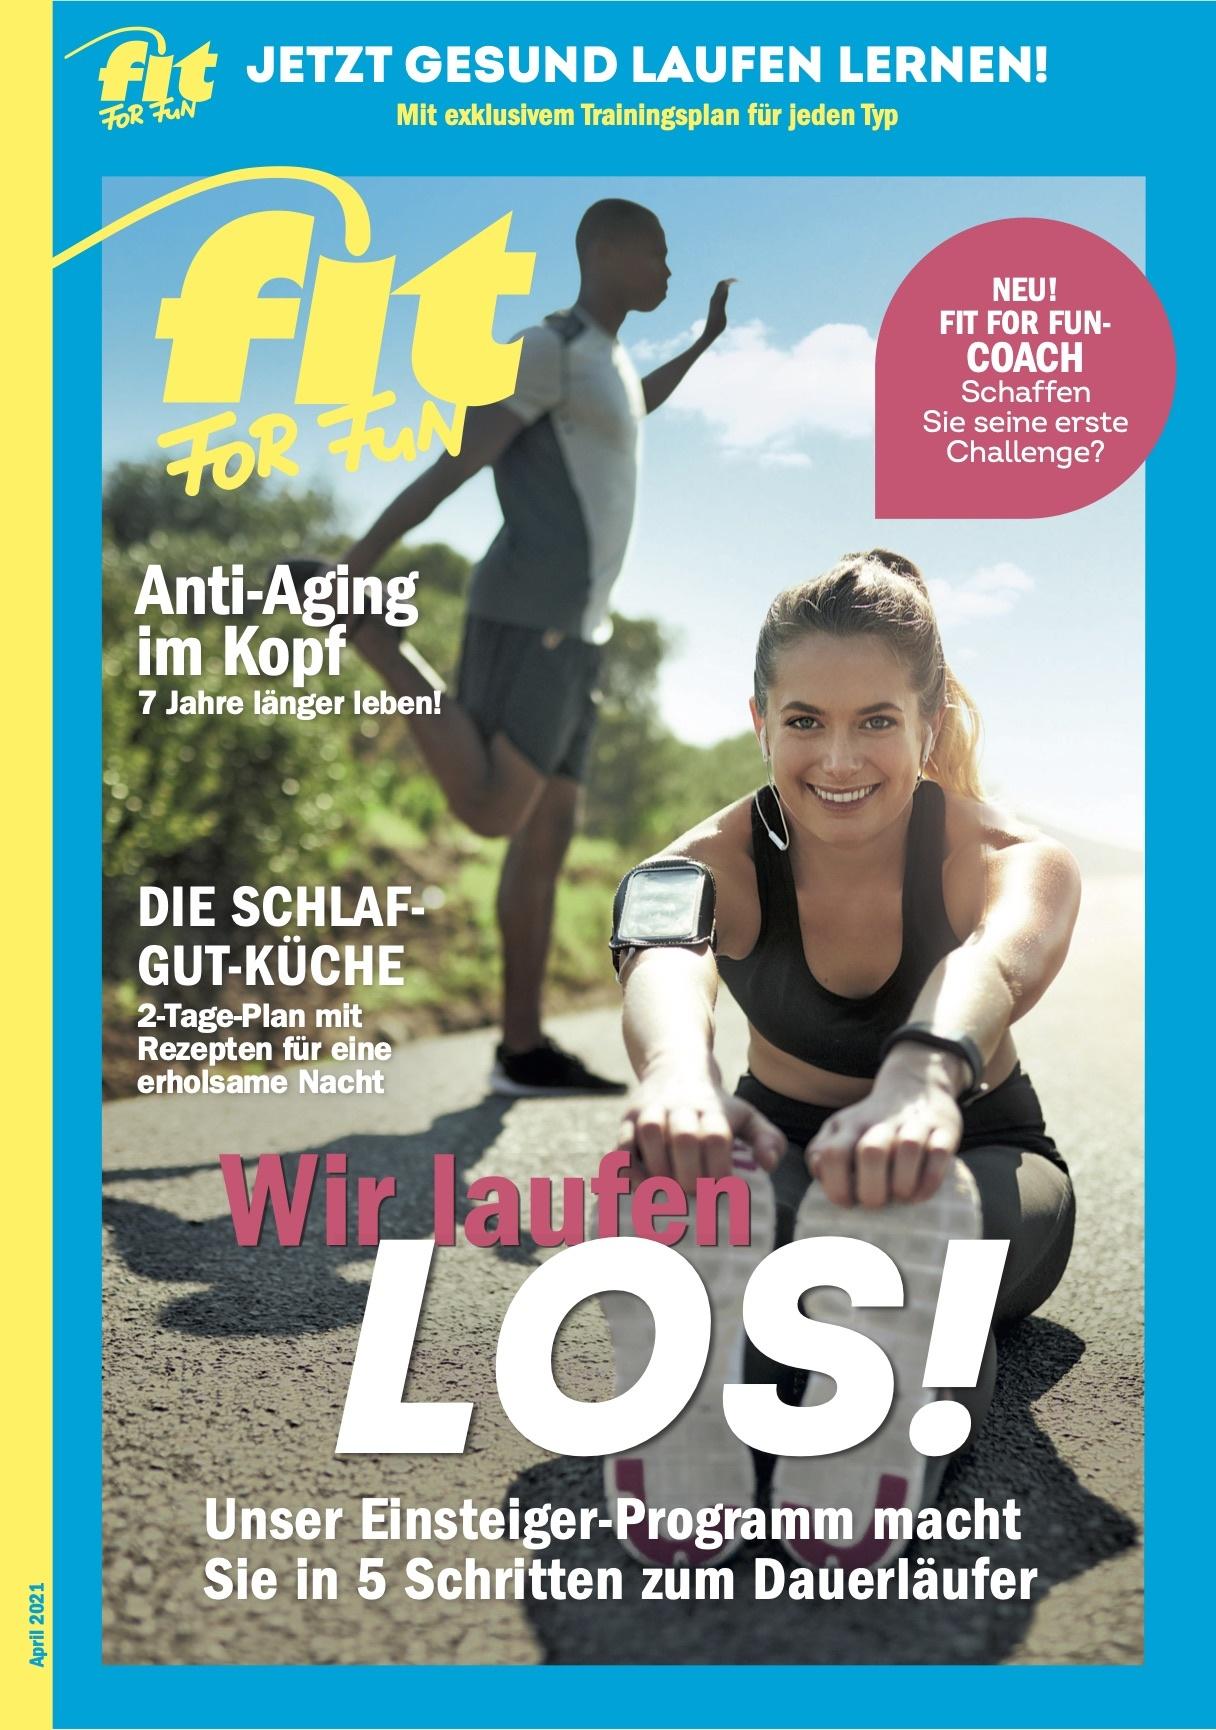 FOCUS Magazin Das verlorene Jahr